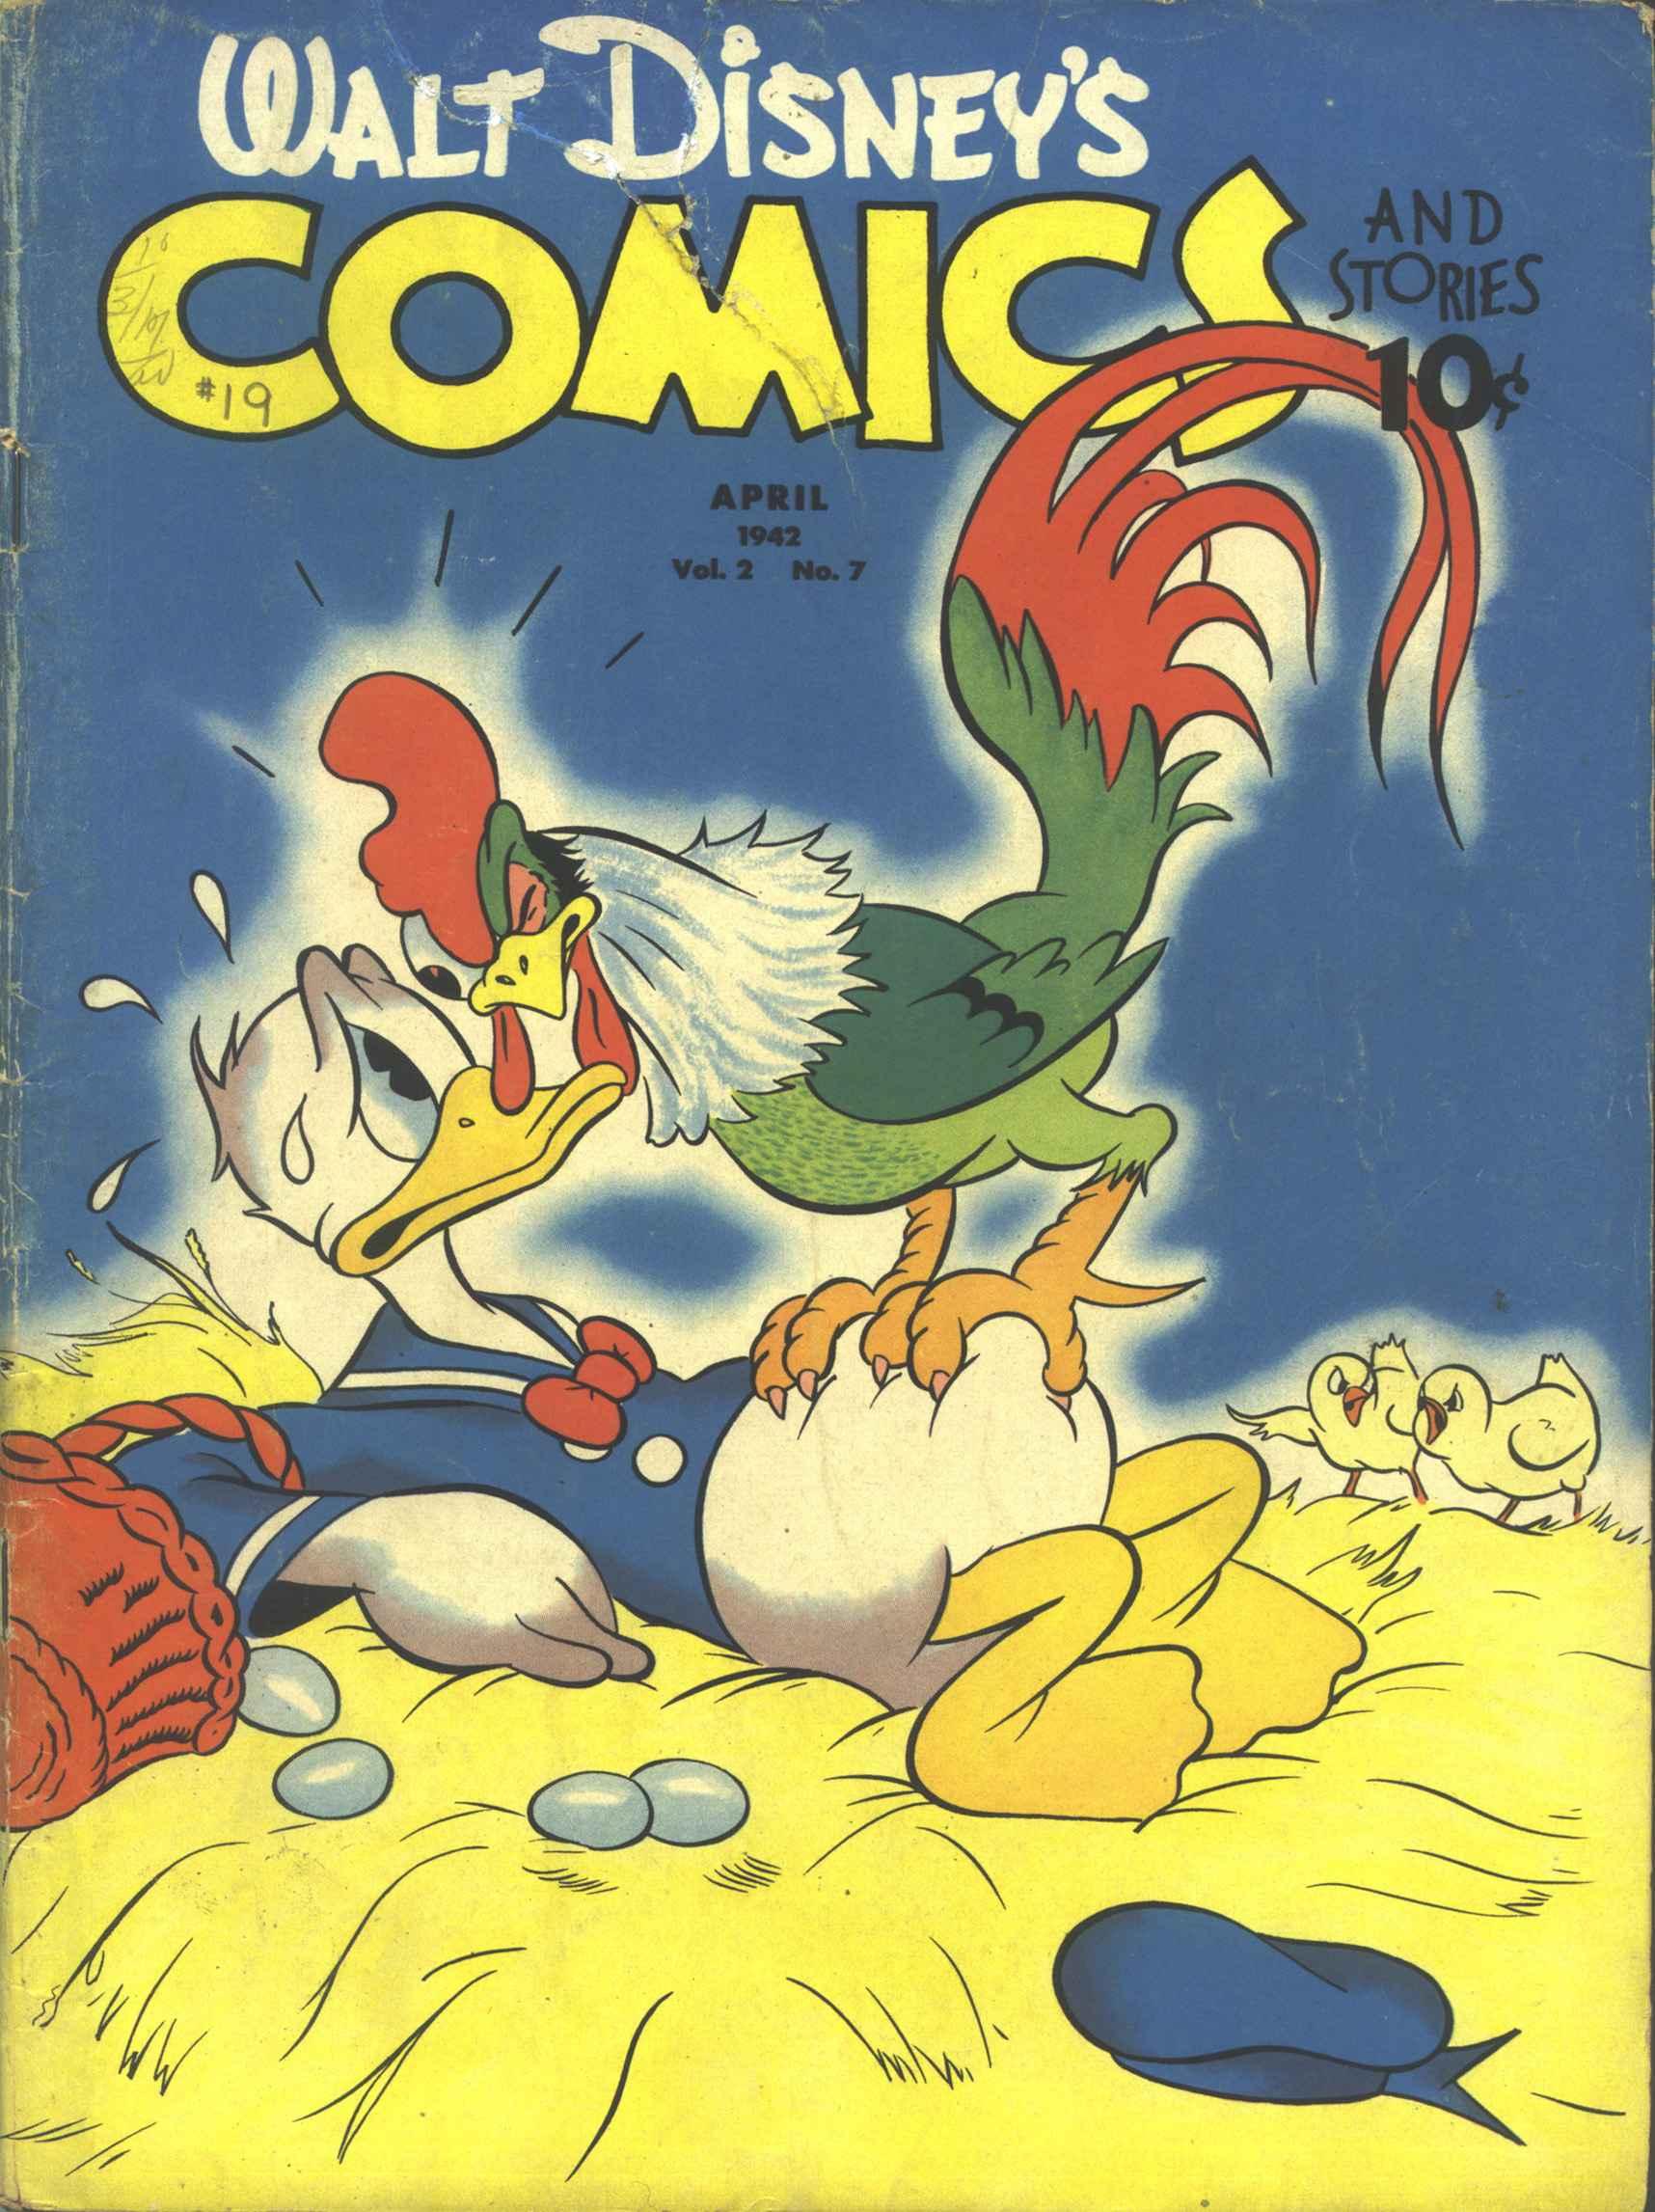 Walt Disneys Comics and Stories 19 Page 1